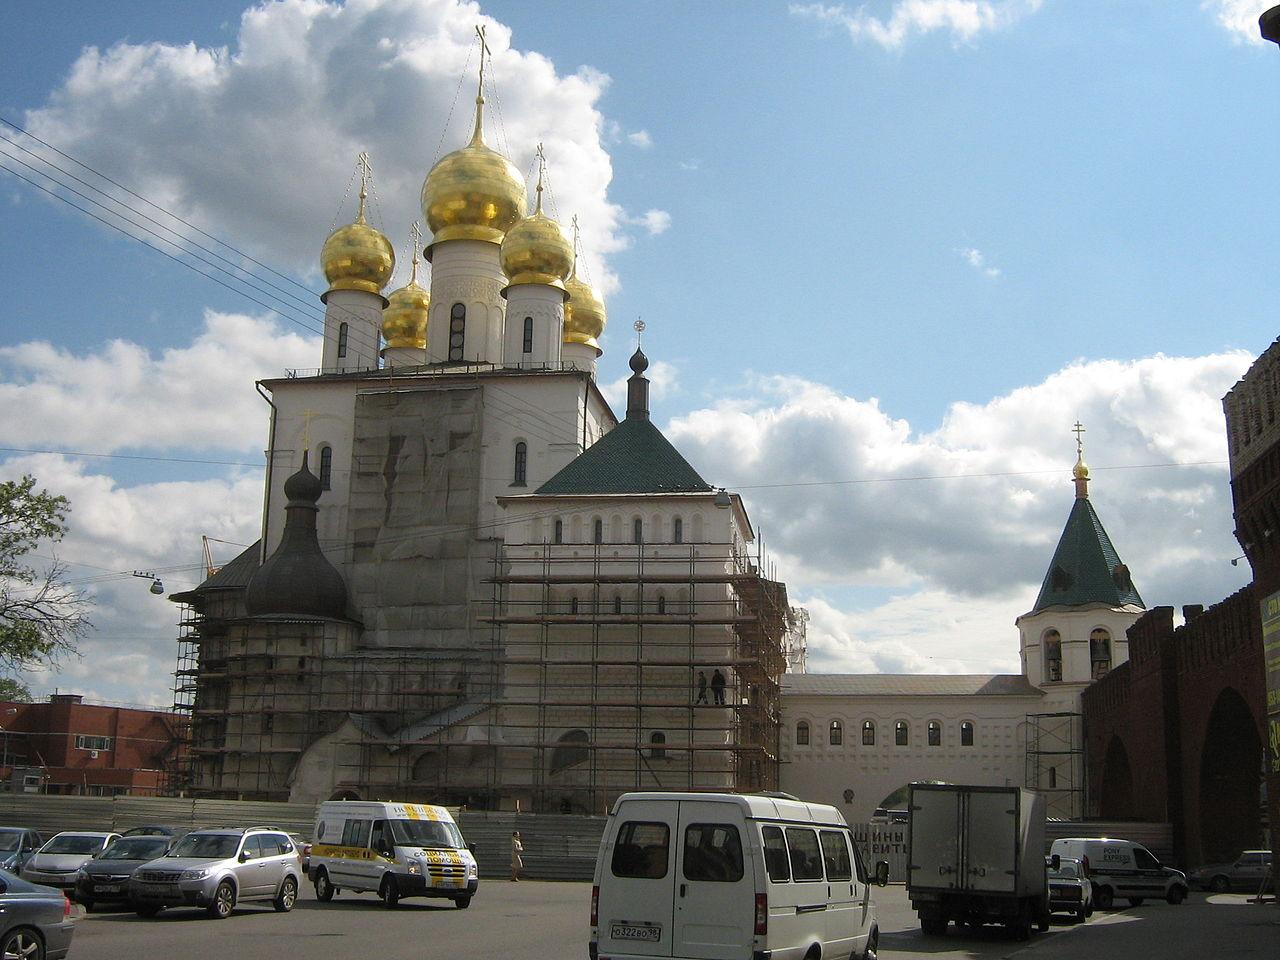 Санкт-Петербург. Миргородская улица, Фёдоровский собор. Фото: Peterburg23 (Wikimedia Commons)